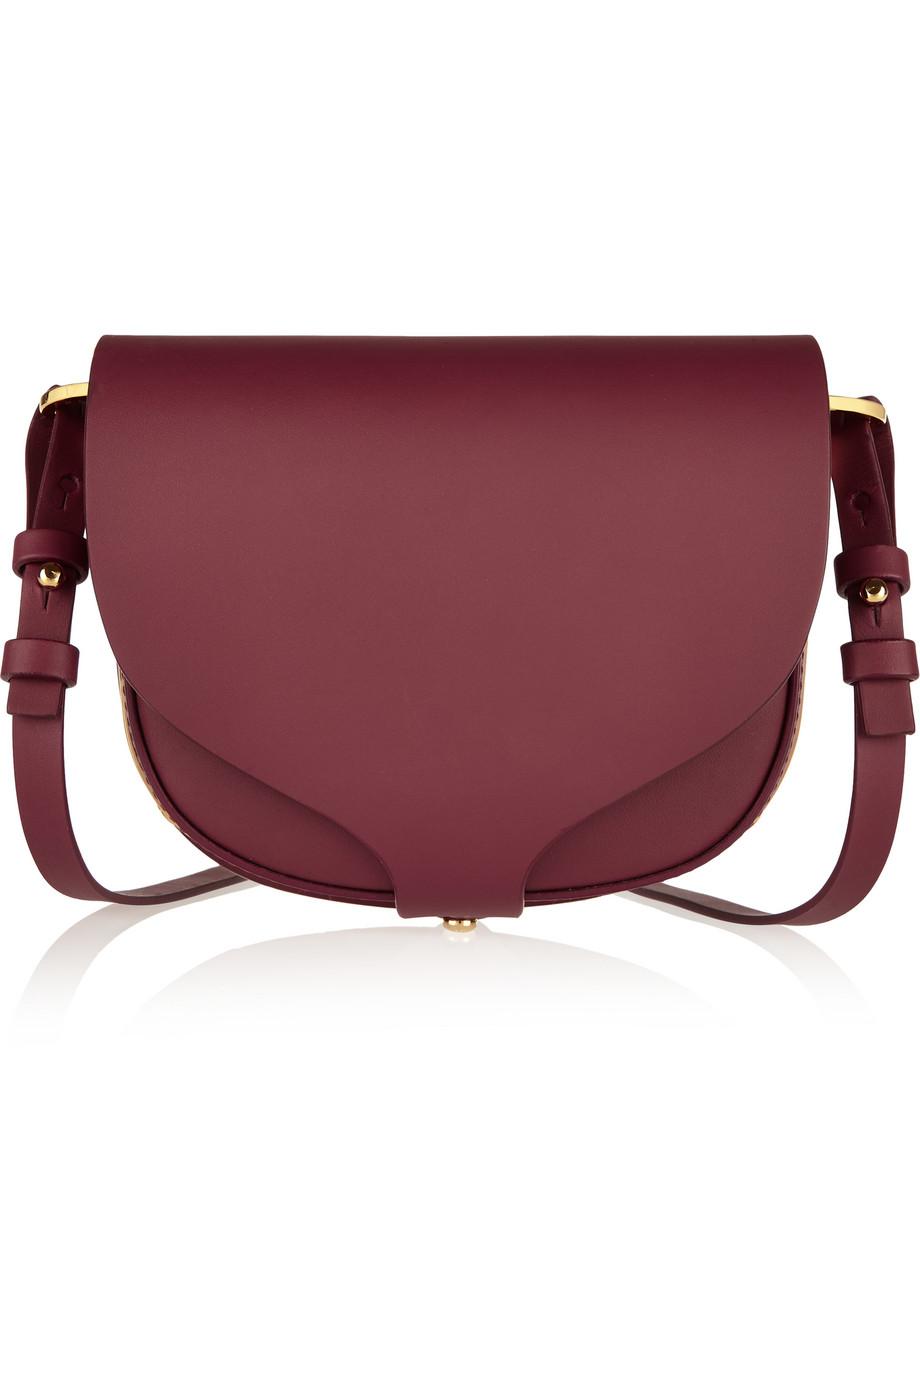 Sophie Hulme Barnsbury Mini Leather Shoulder Bag, Burgundy, Women's